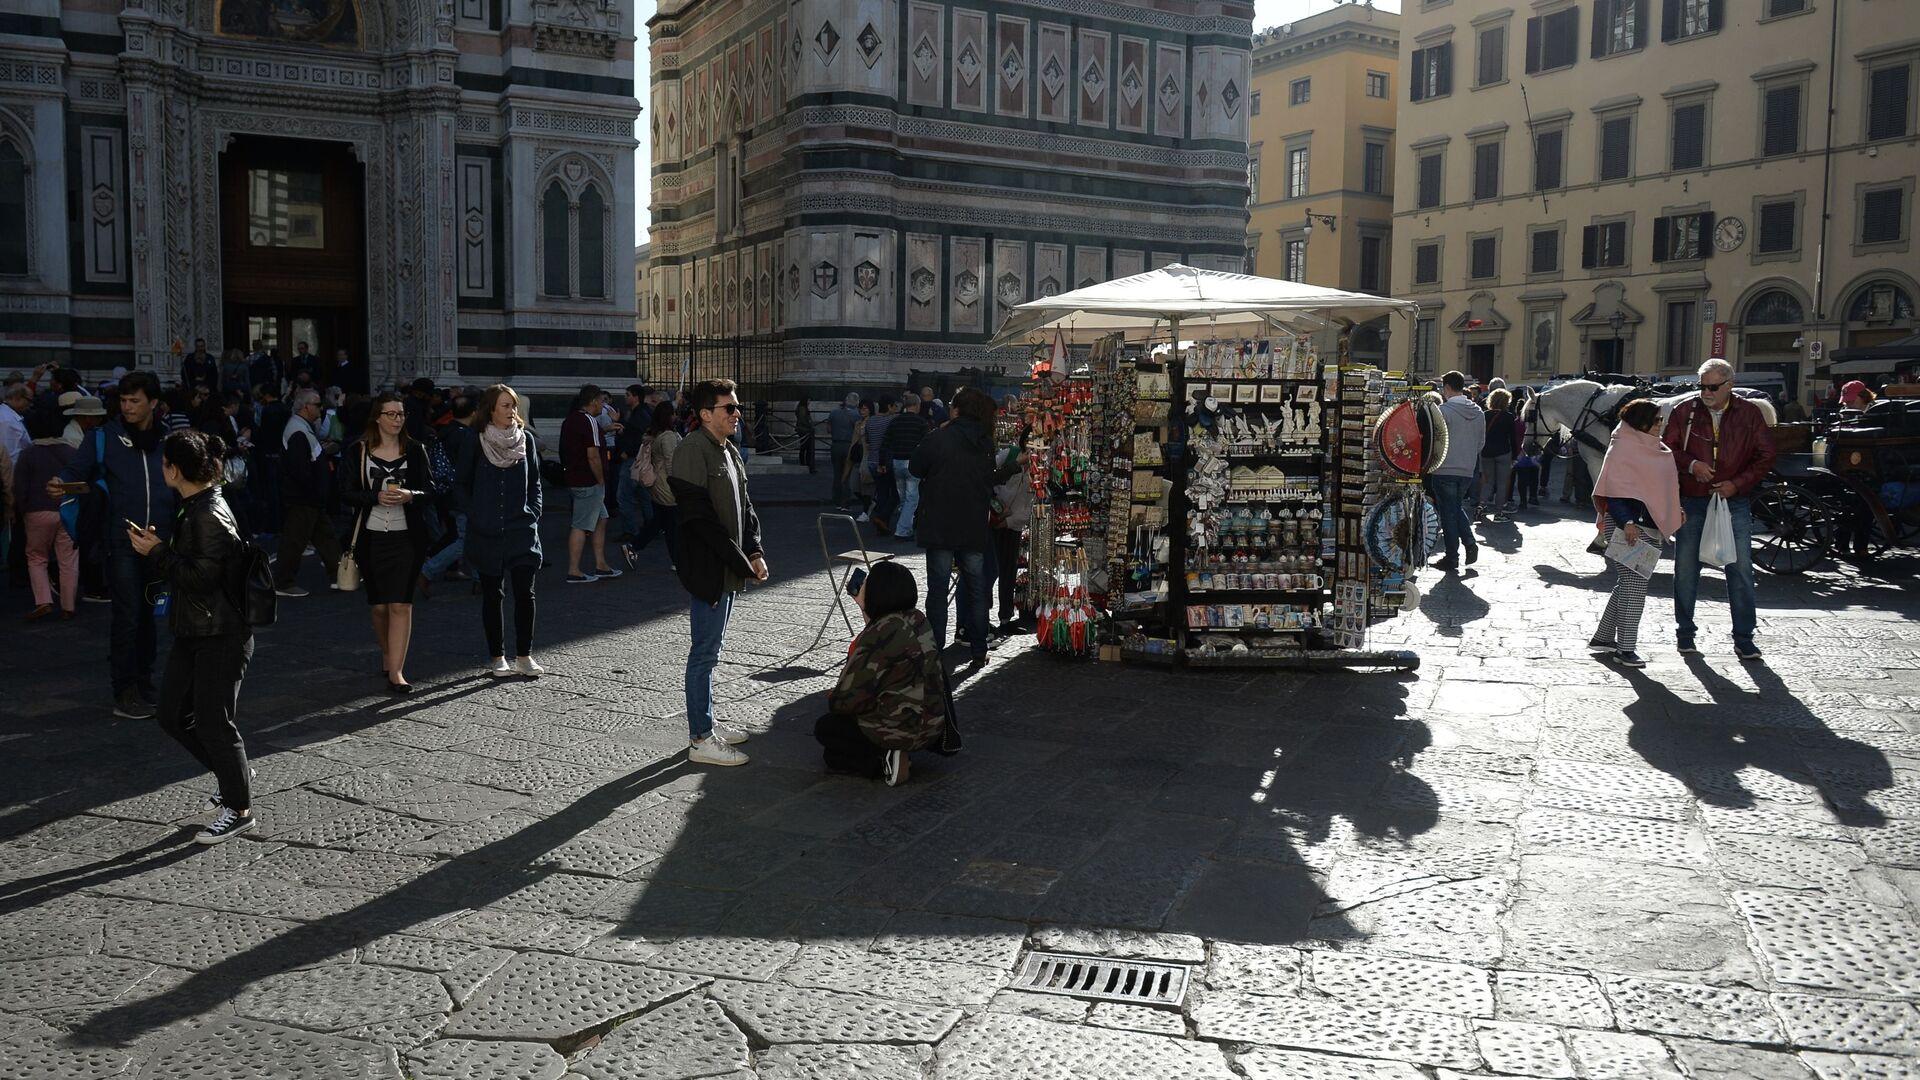 Piazza del Duomo di Firenze - Sputnik Italia, 1920, 05.07.2021